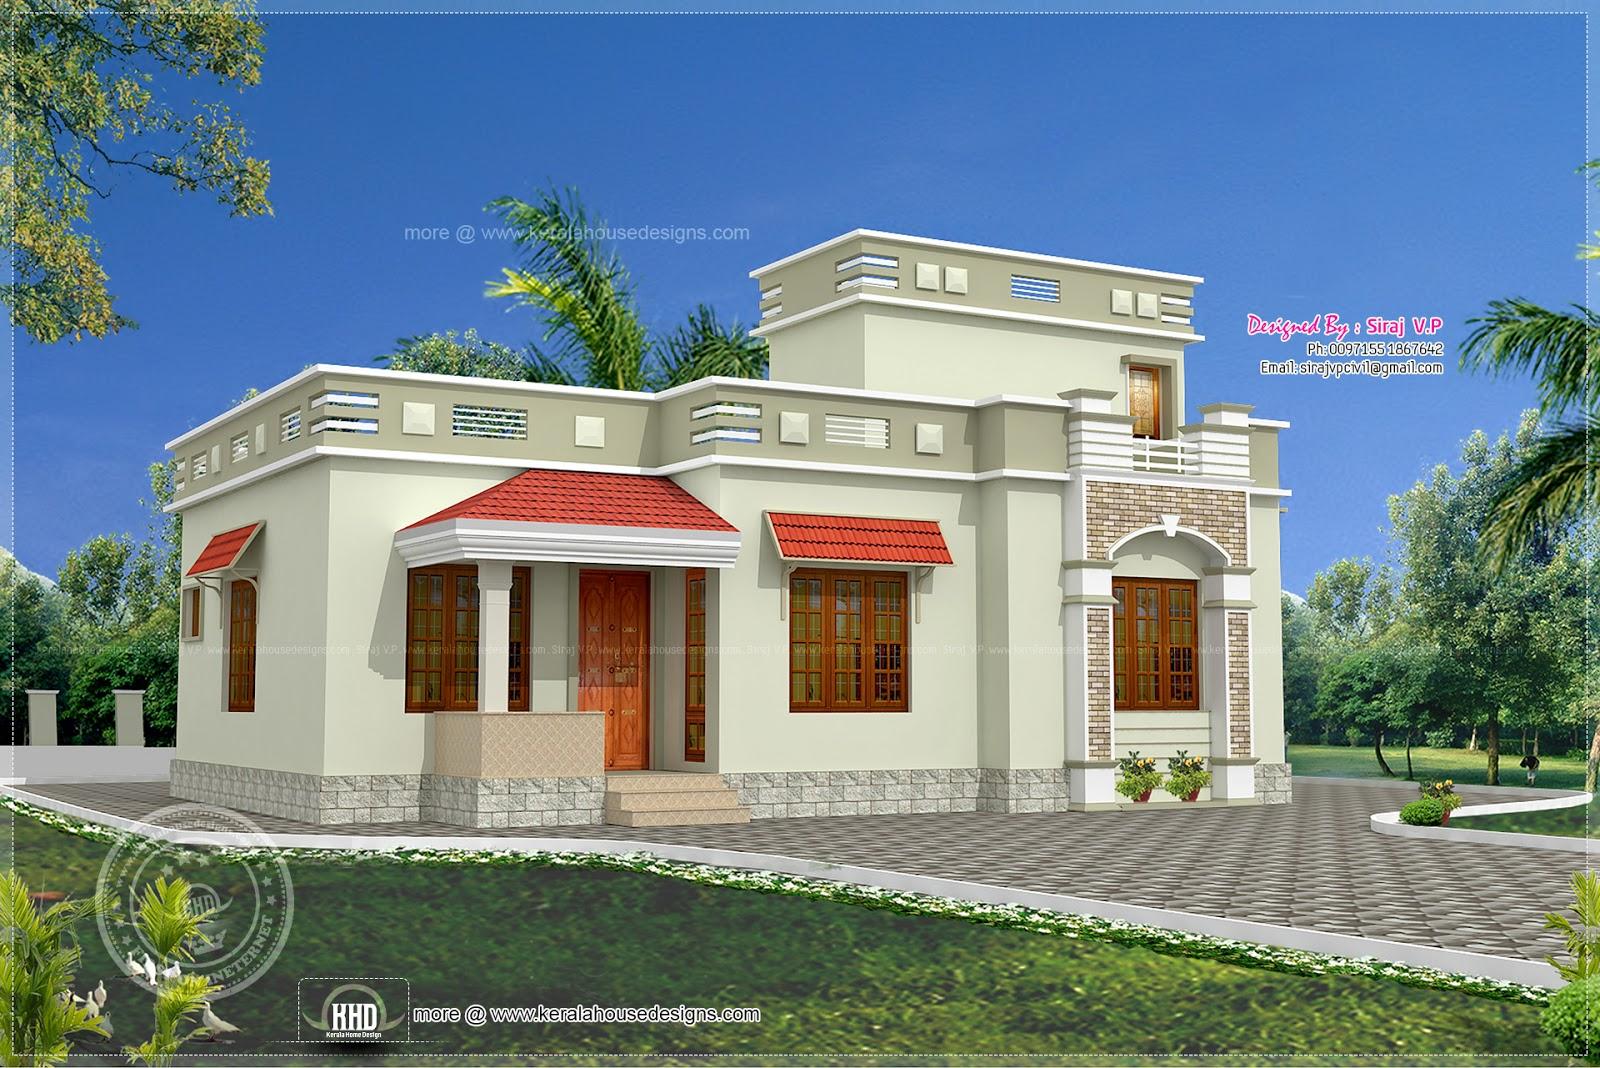 Low Budget Kerala Style Home In 1075 Sq Feet Kerala Home